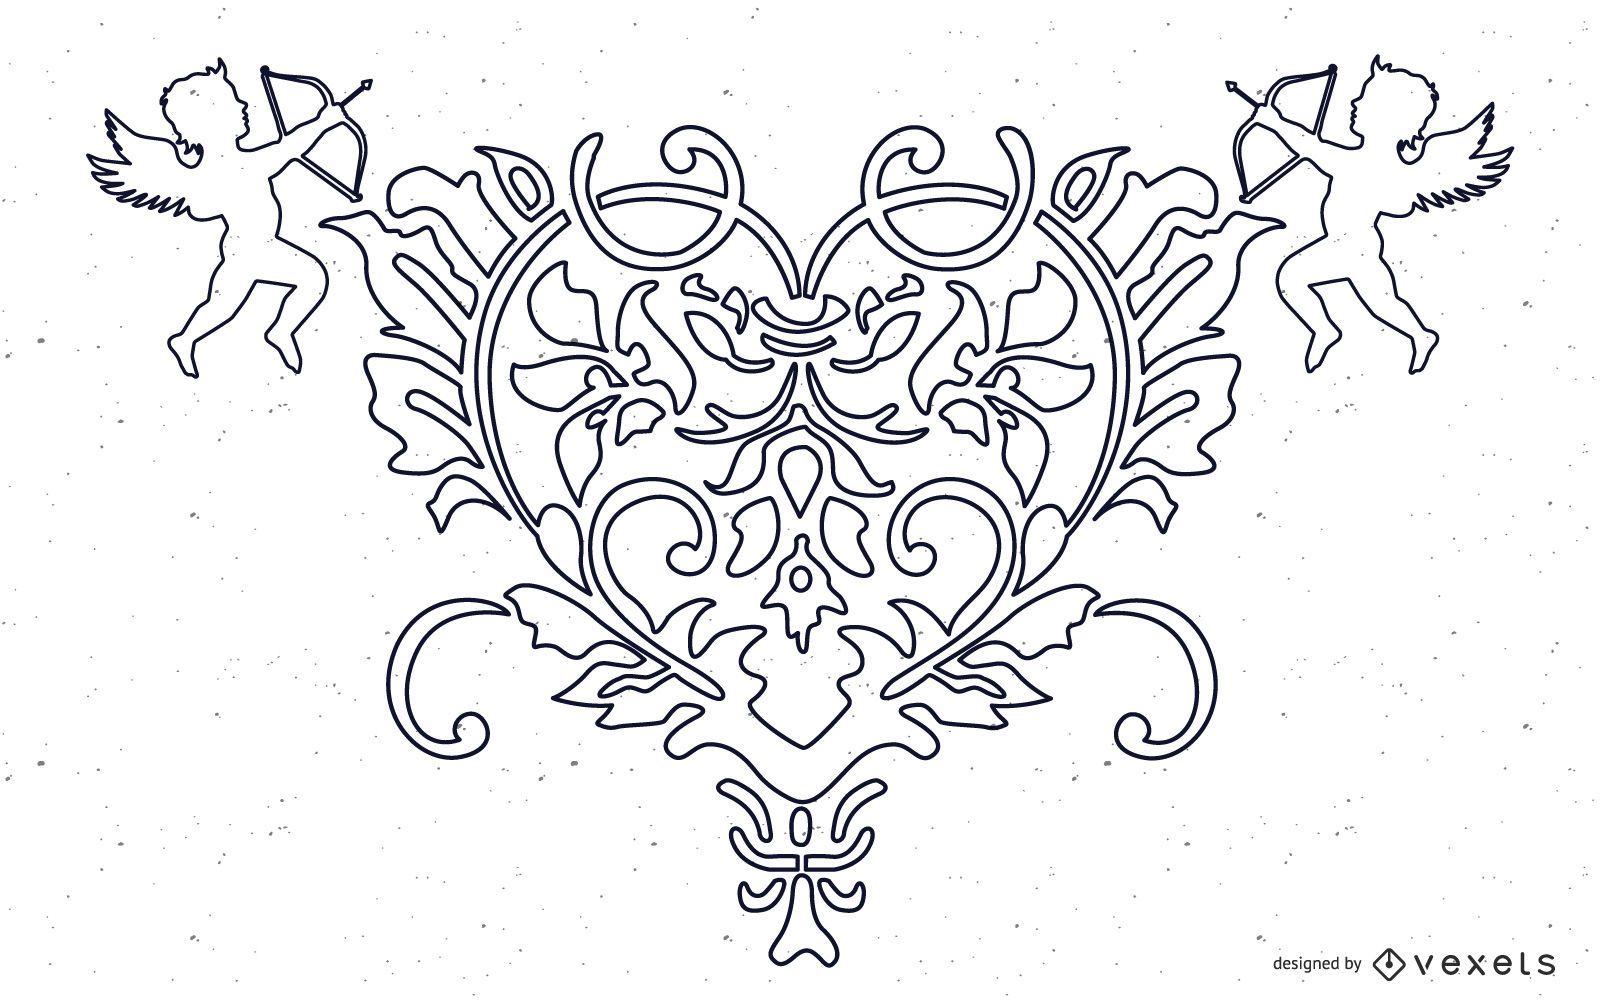 VECTOR GRATIS DE FANTASY HEART ANGEL ORNATE